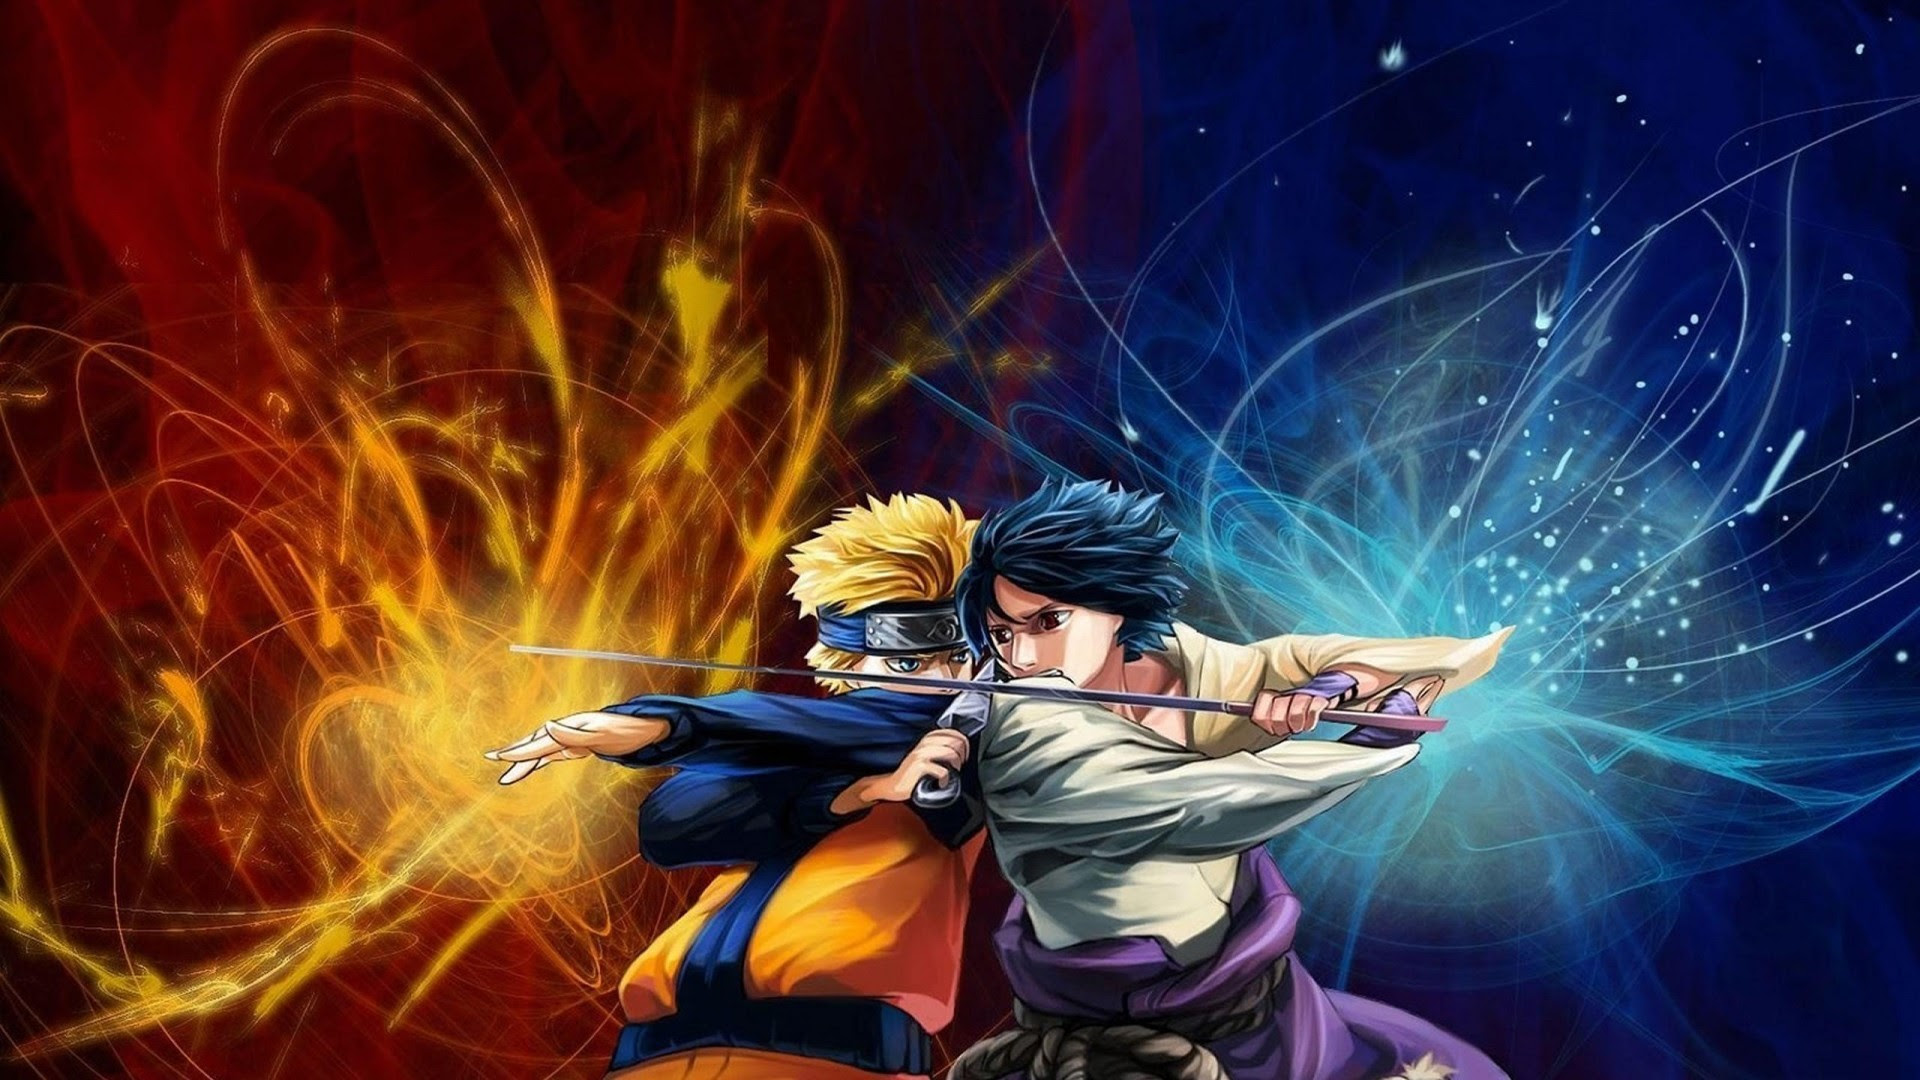 Unduh 54 Koleksi Wallpaper Naruto Shippuden Hd 1366x768 Terbaik